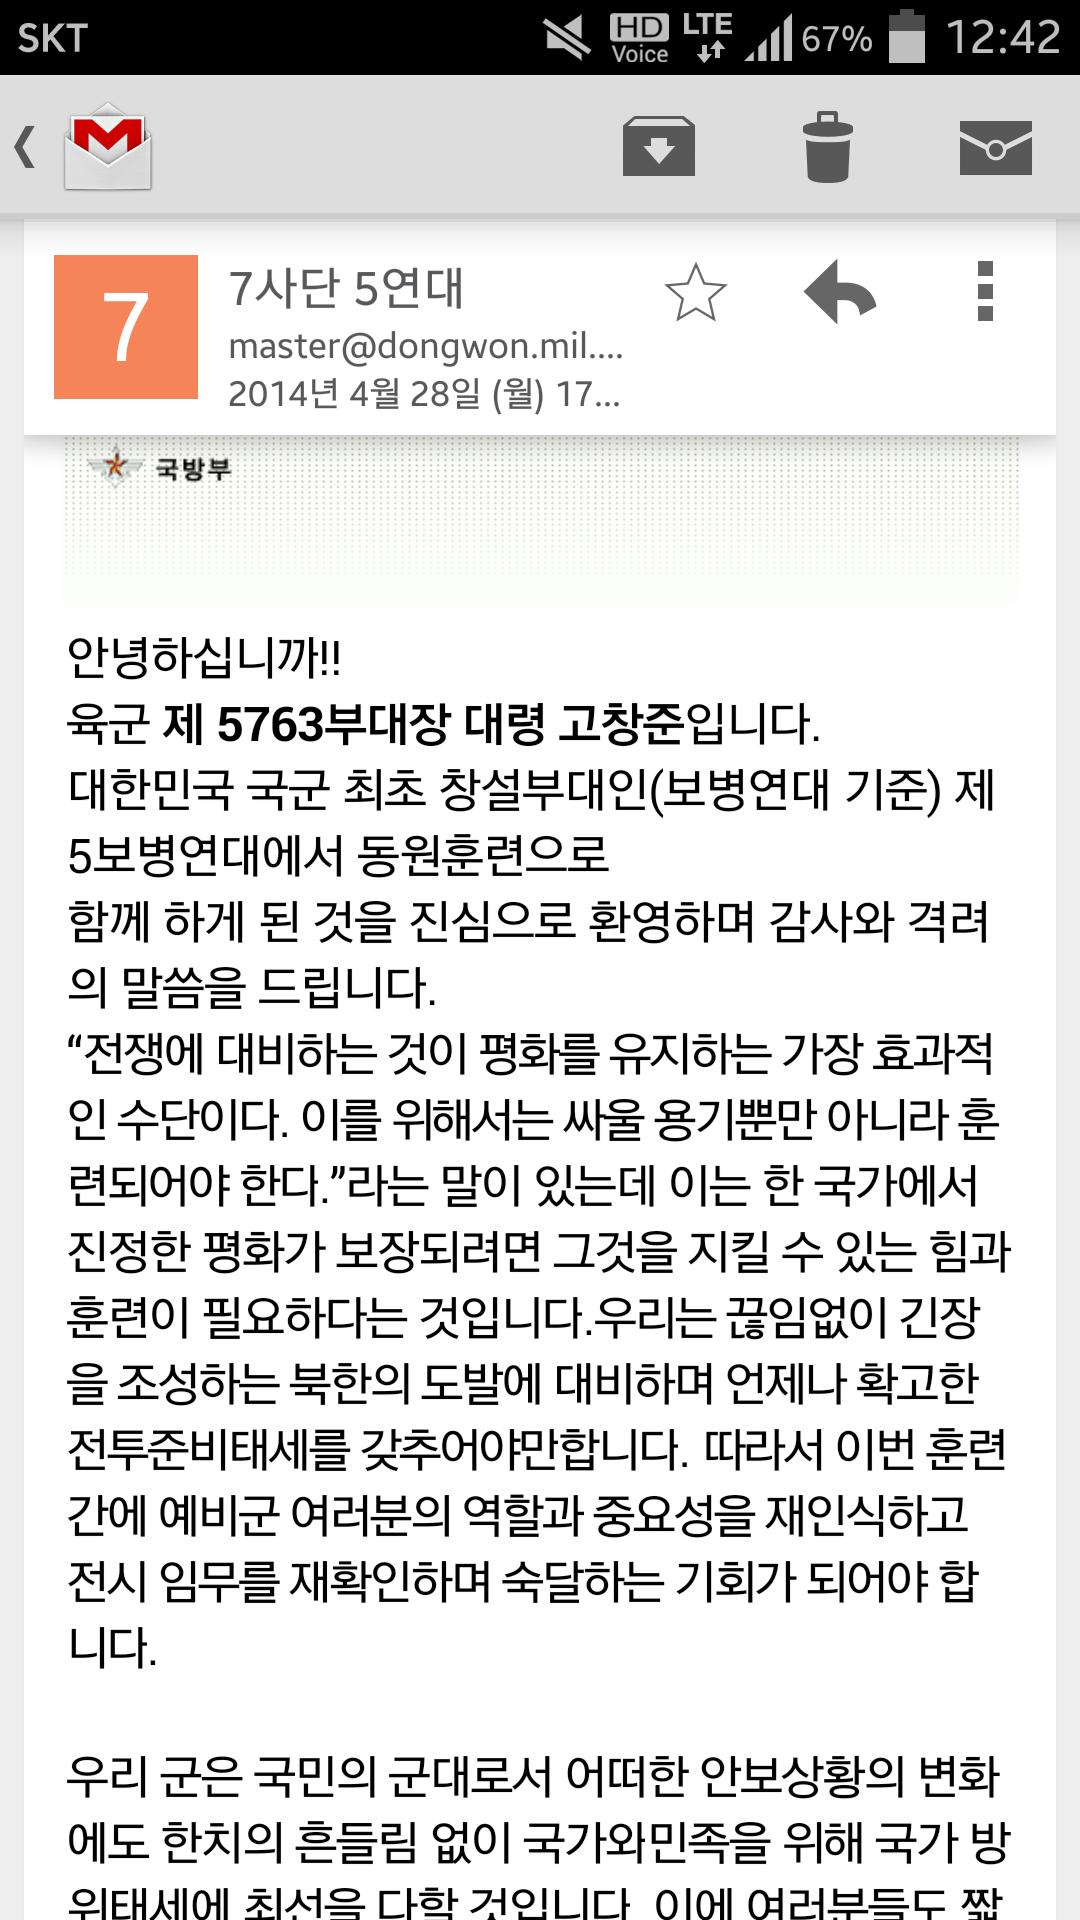 Screenshot_2014-05-05-12-42-22.png